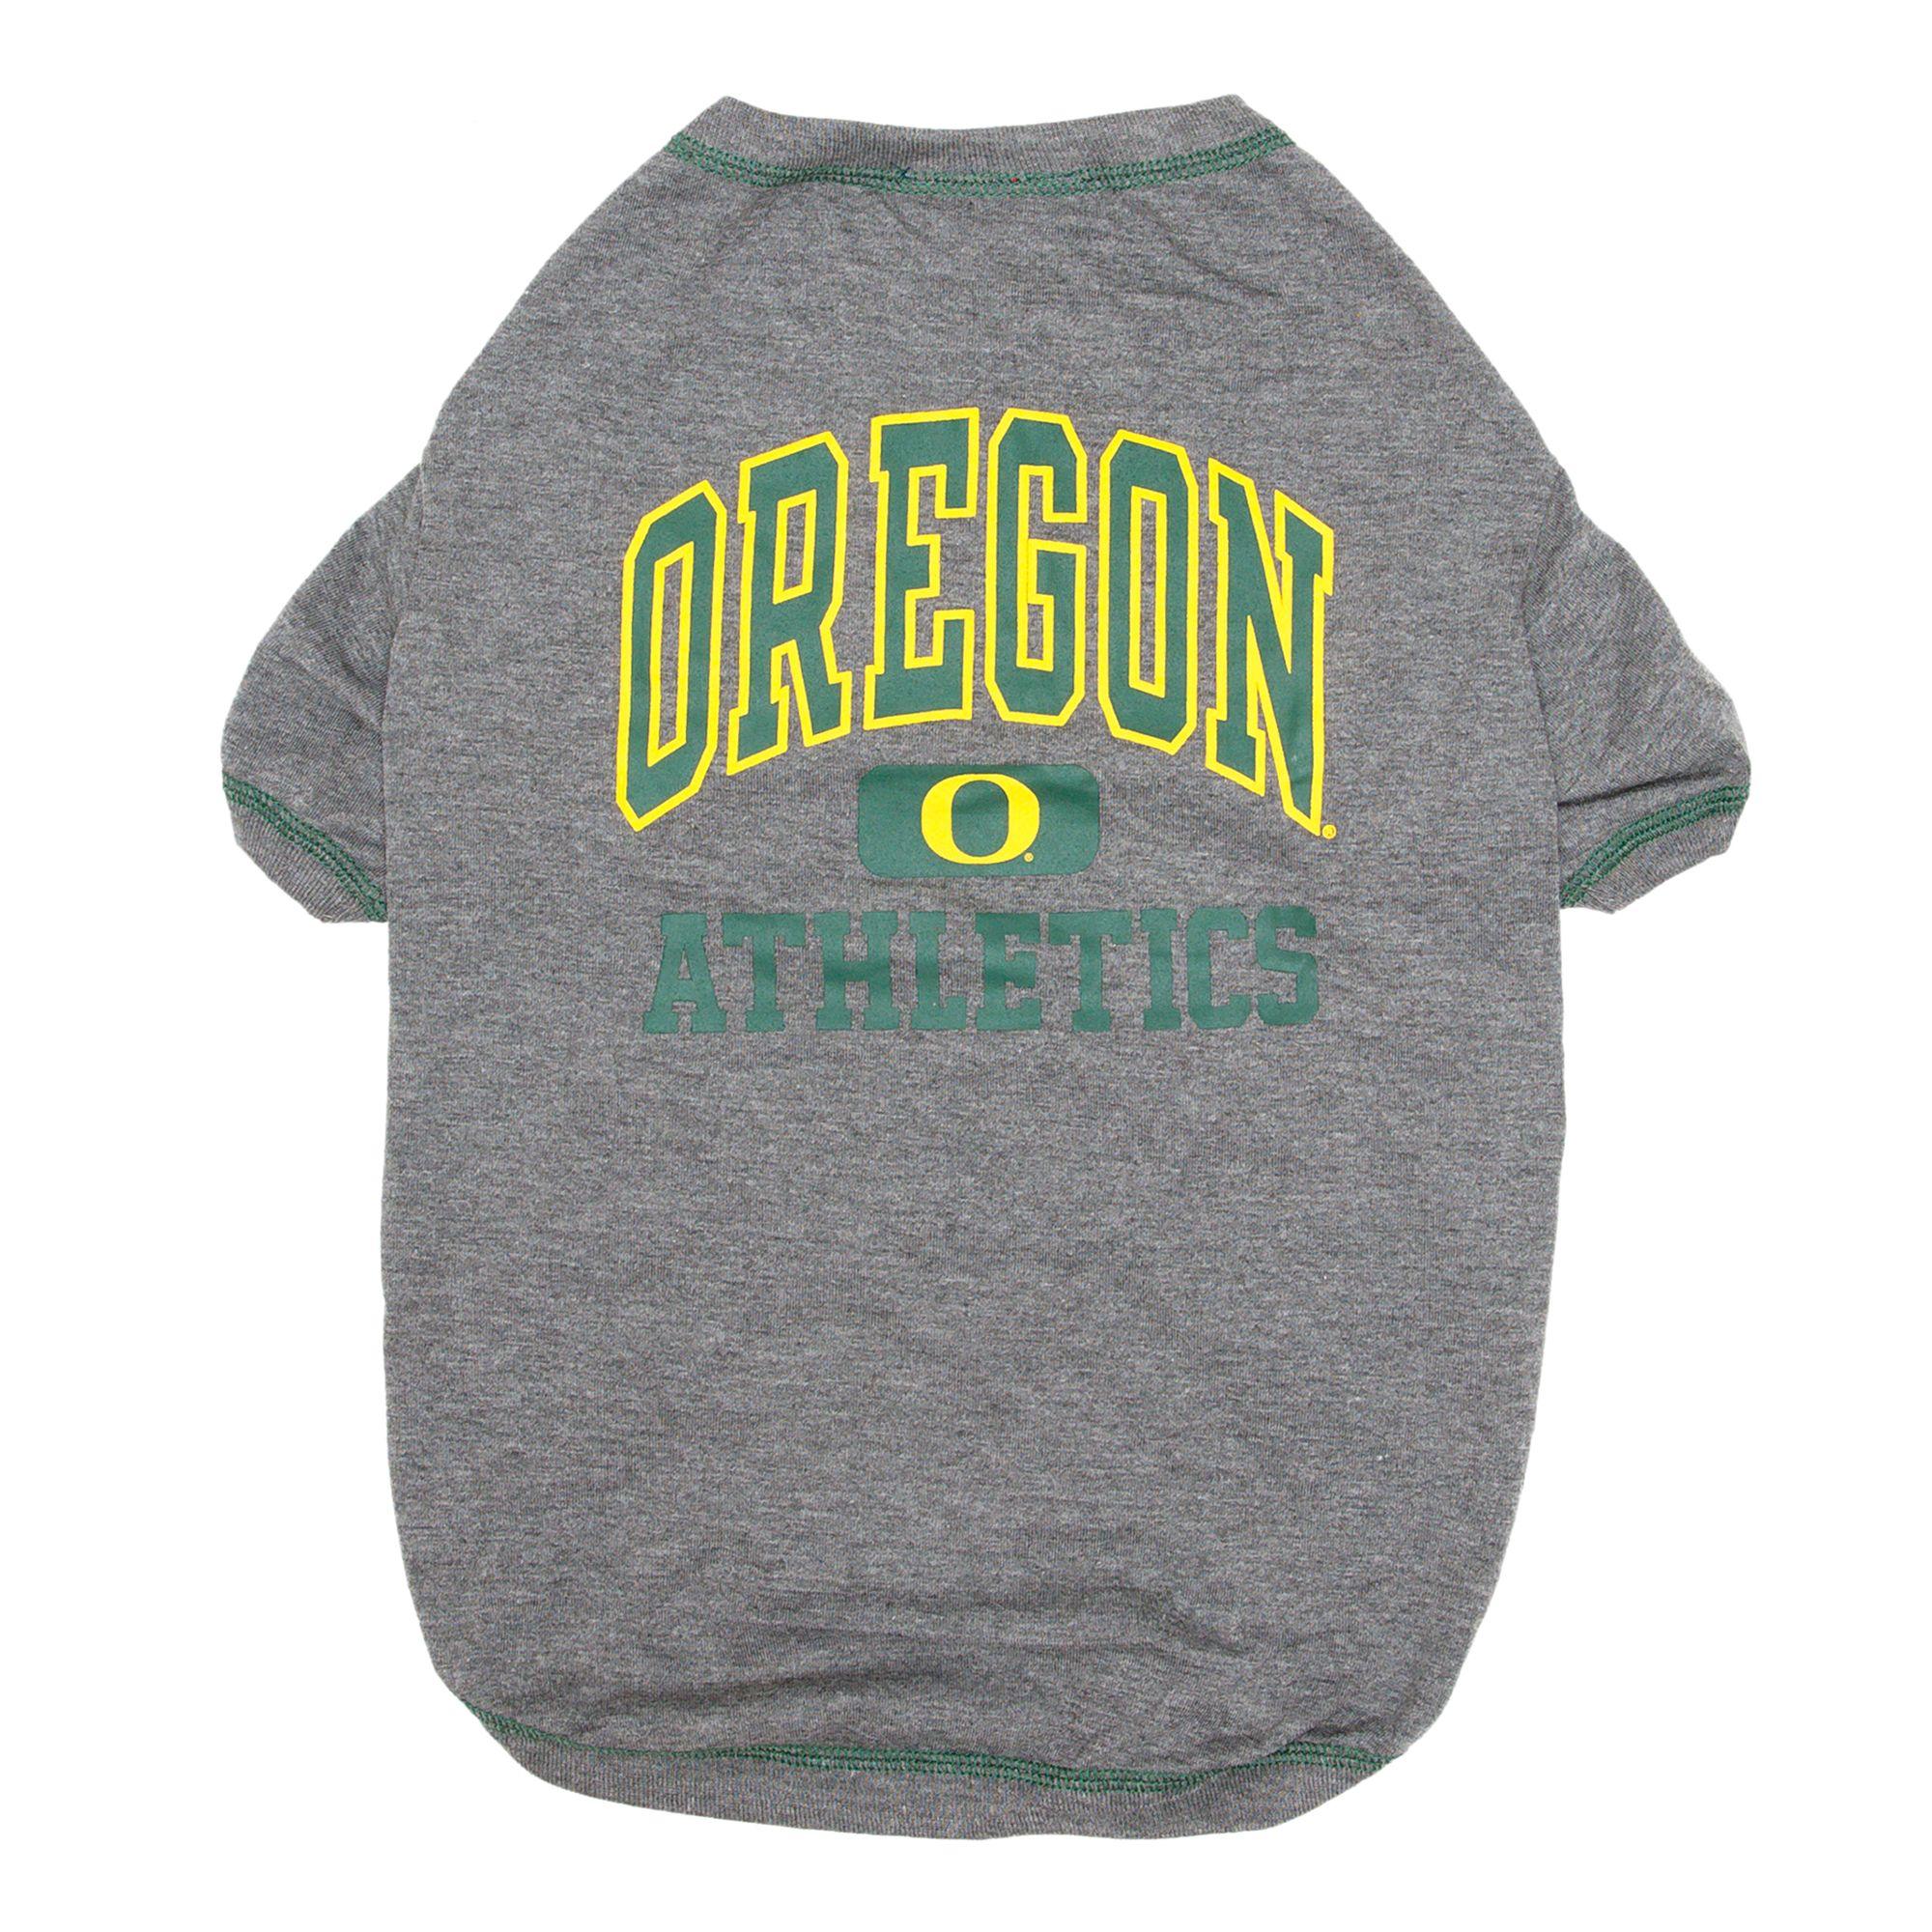 University of Oregon Ducks Ncaa Team Tee size: Small, Pets First 5259170